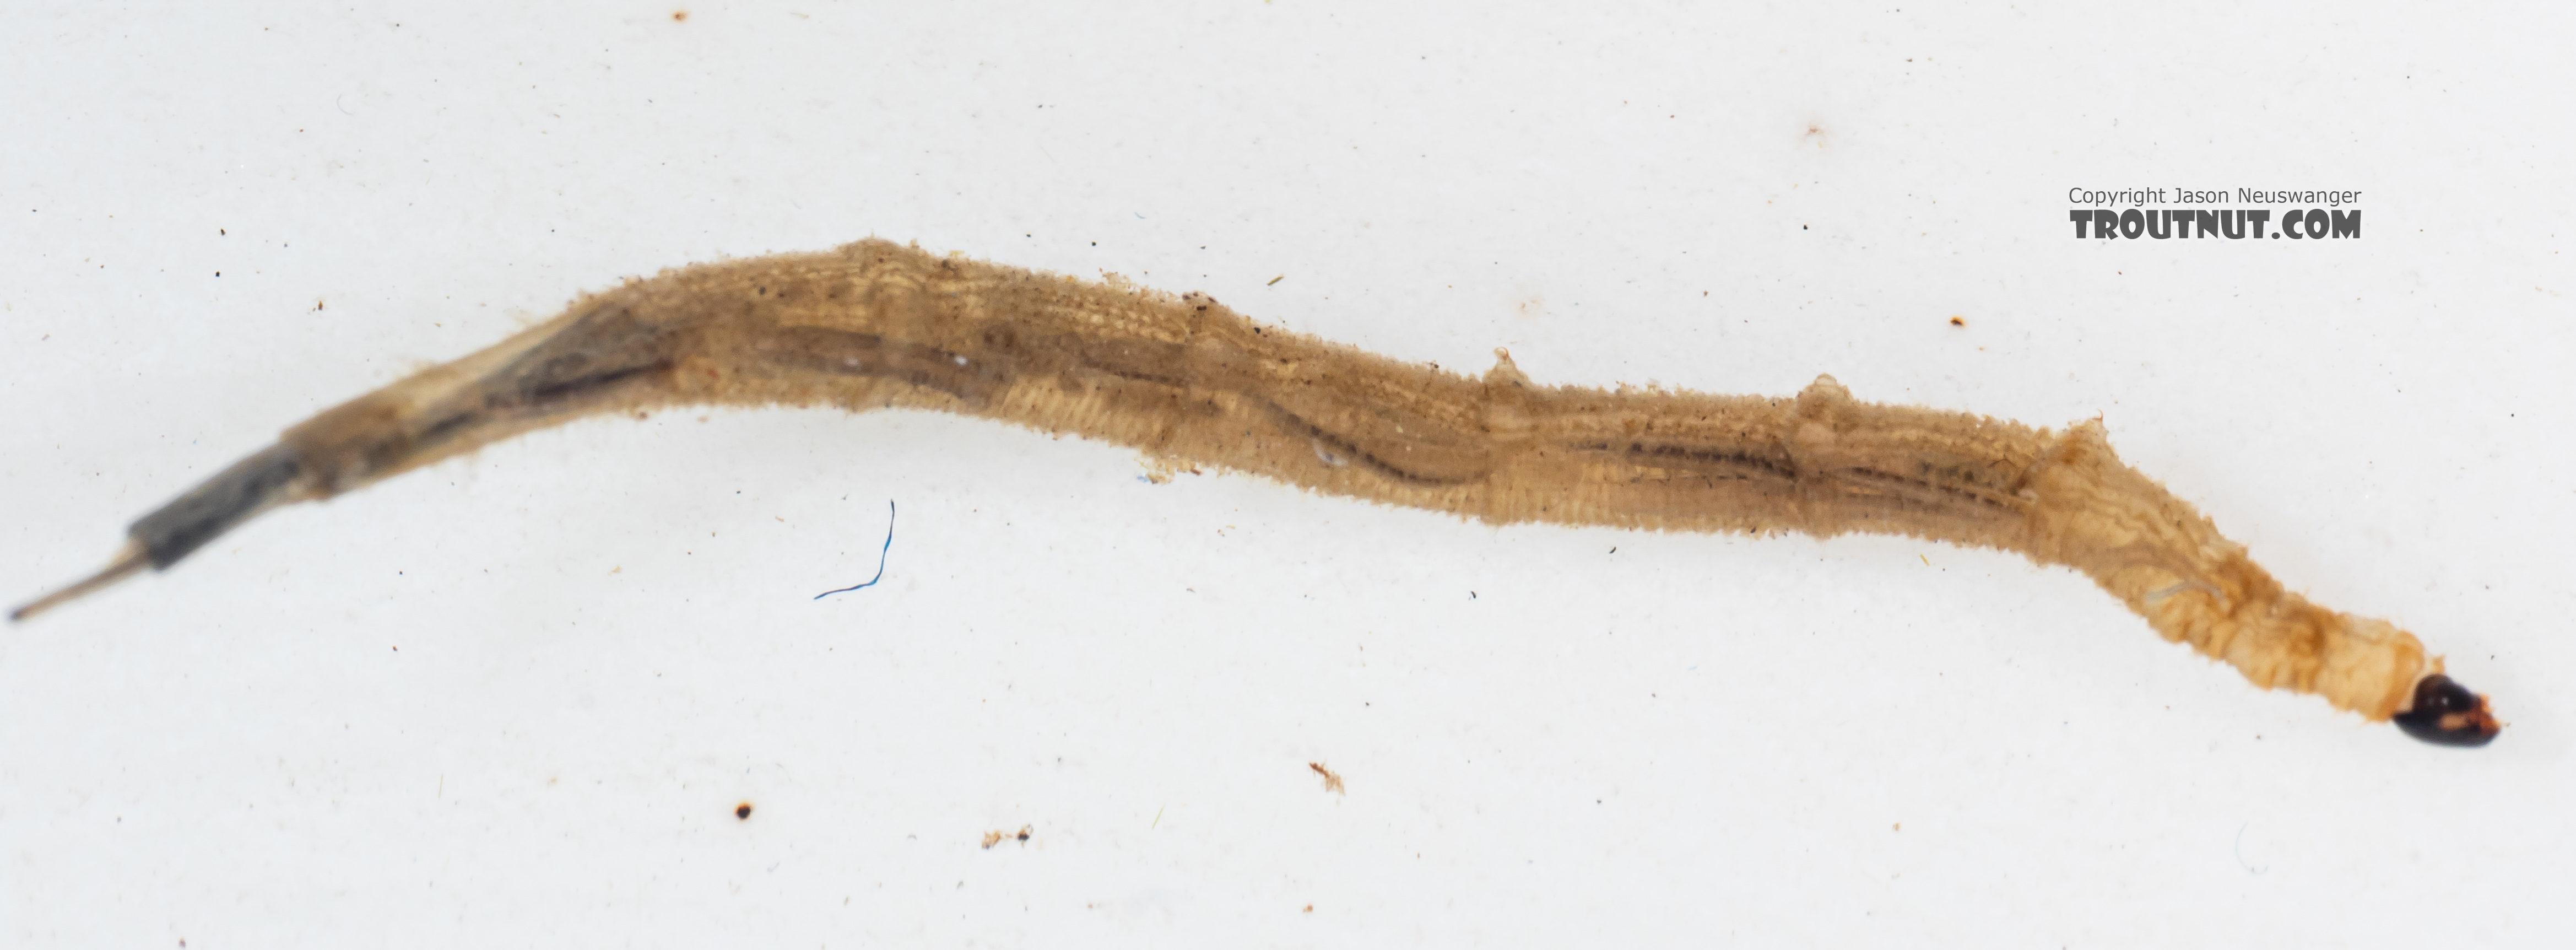 Ptychopteridae (Phantom Crane Flies) Phantom Crane Fly Larva from Mystery Creek #199 in Washington